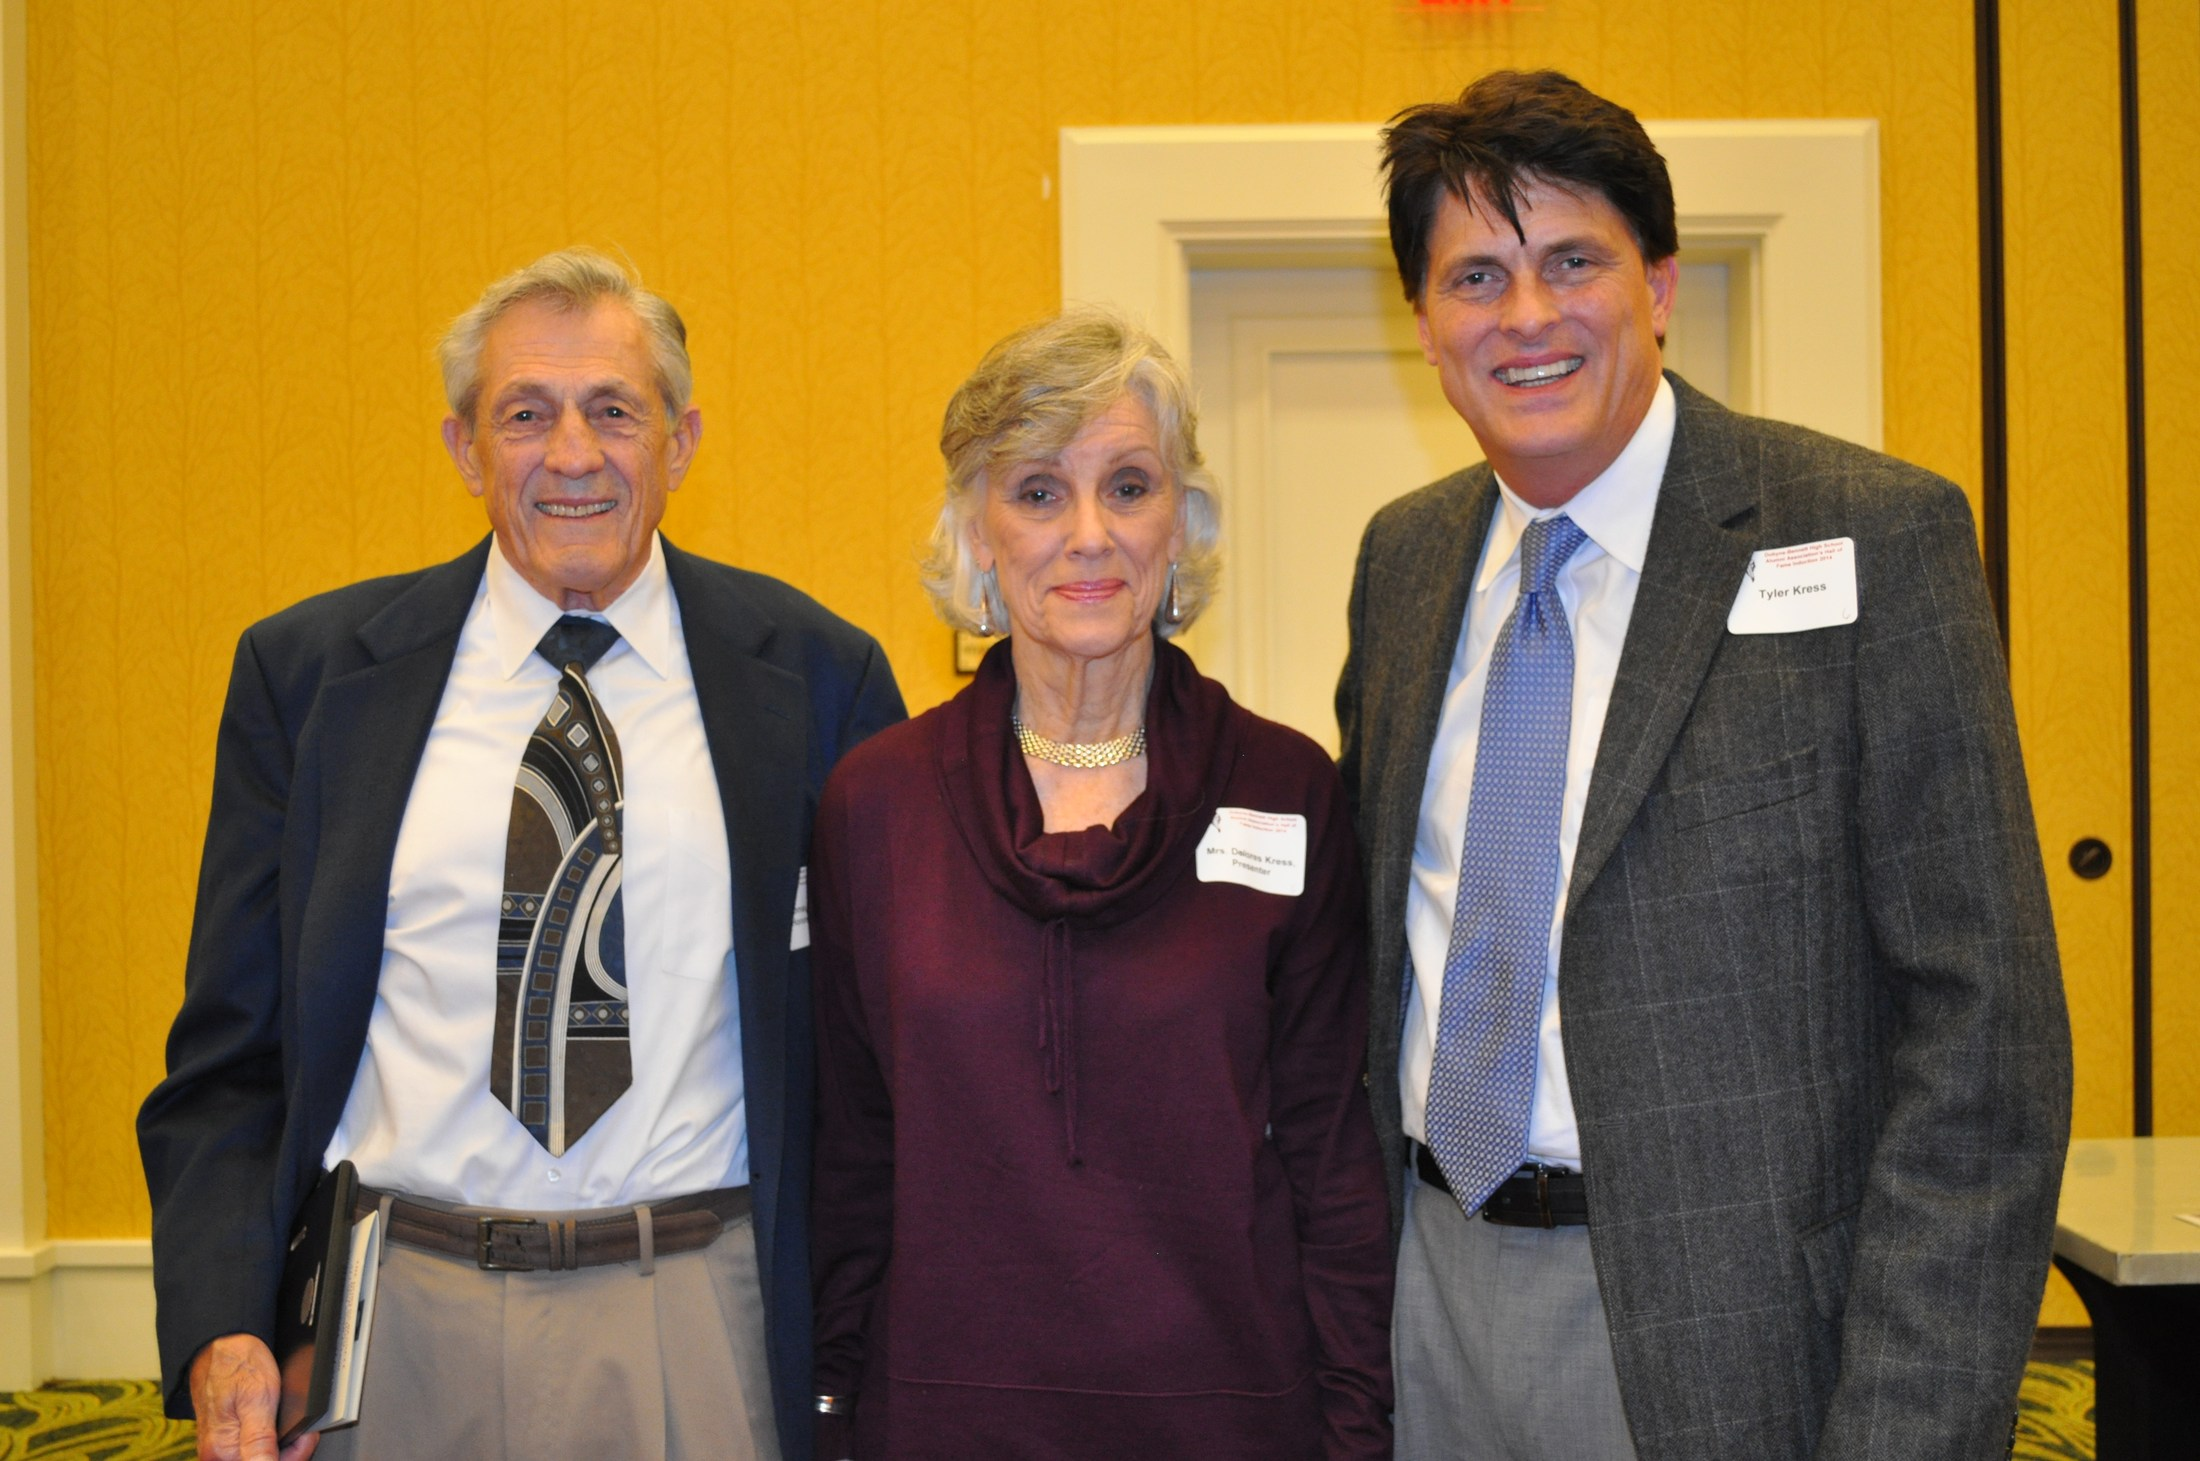 Dr. Thomas S. Kress and family.